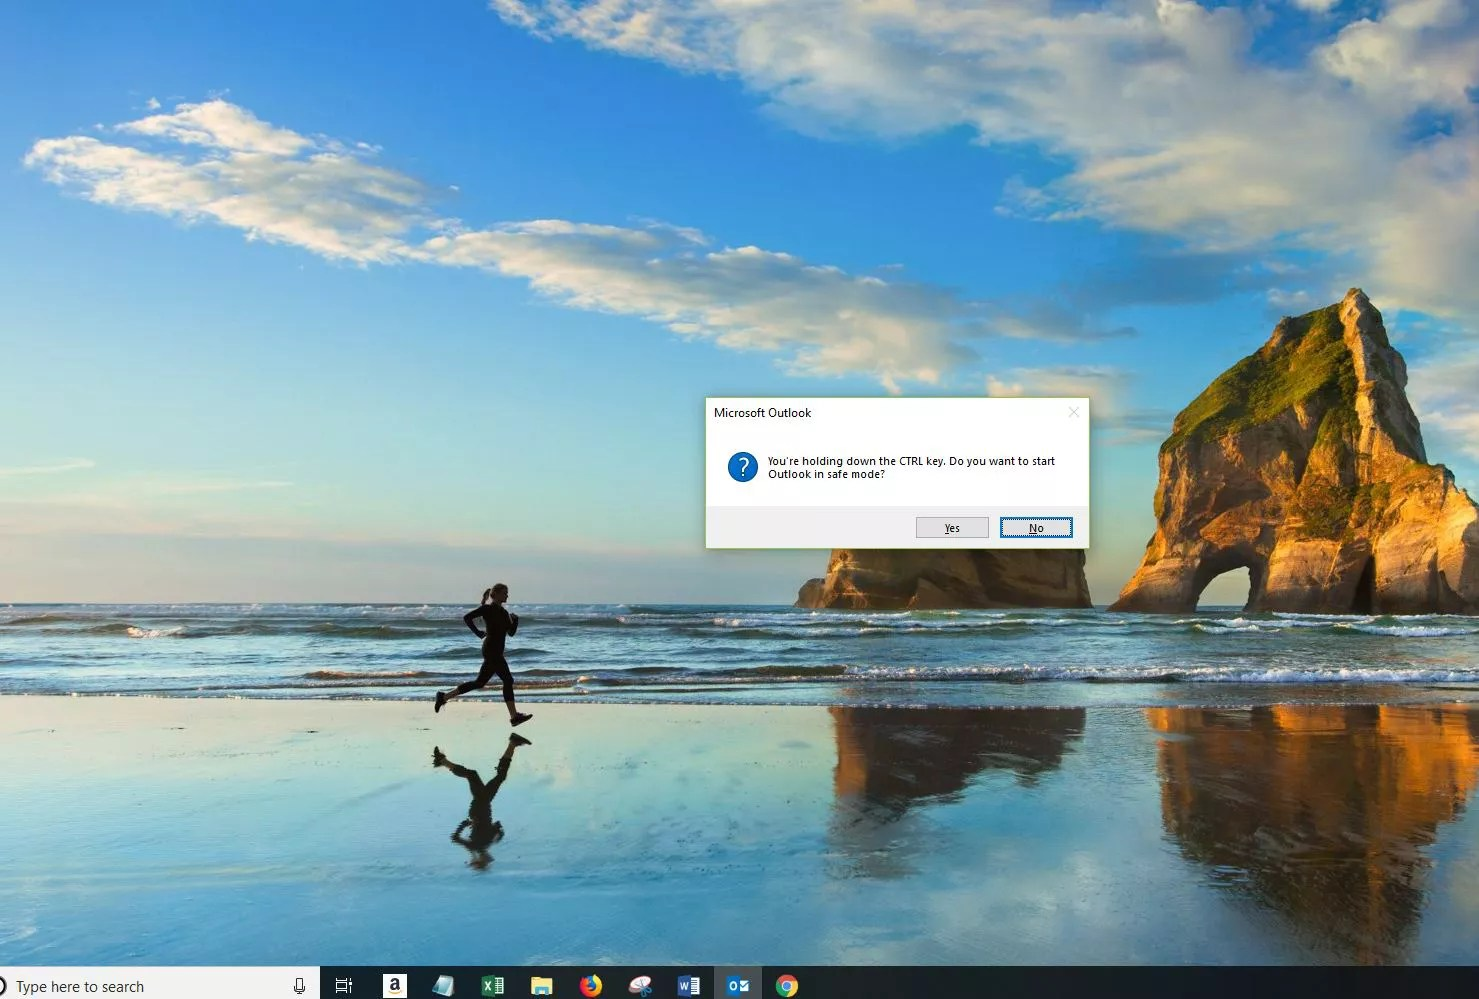 Screenshot of Safe Mode Confirmation window